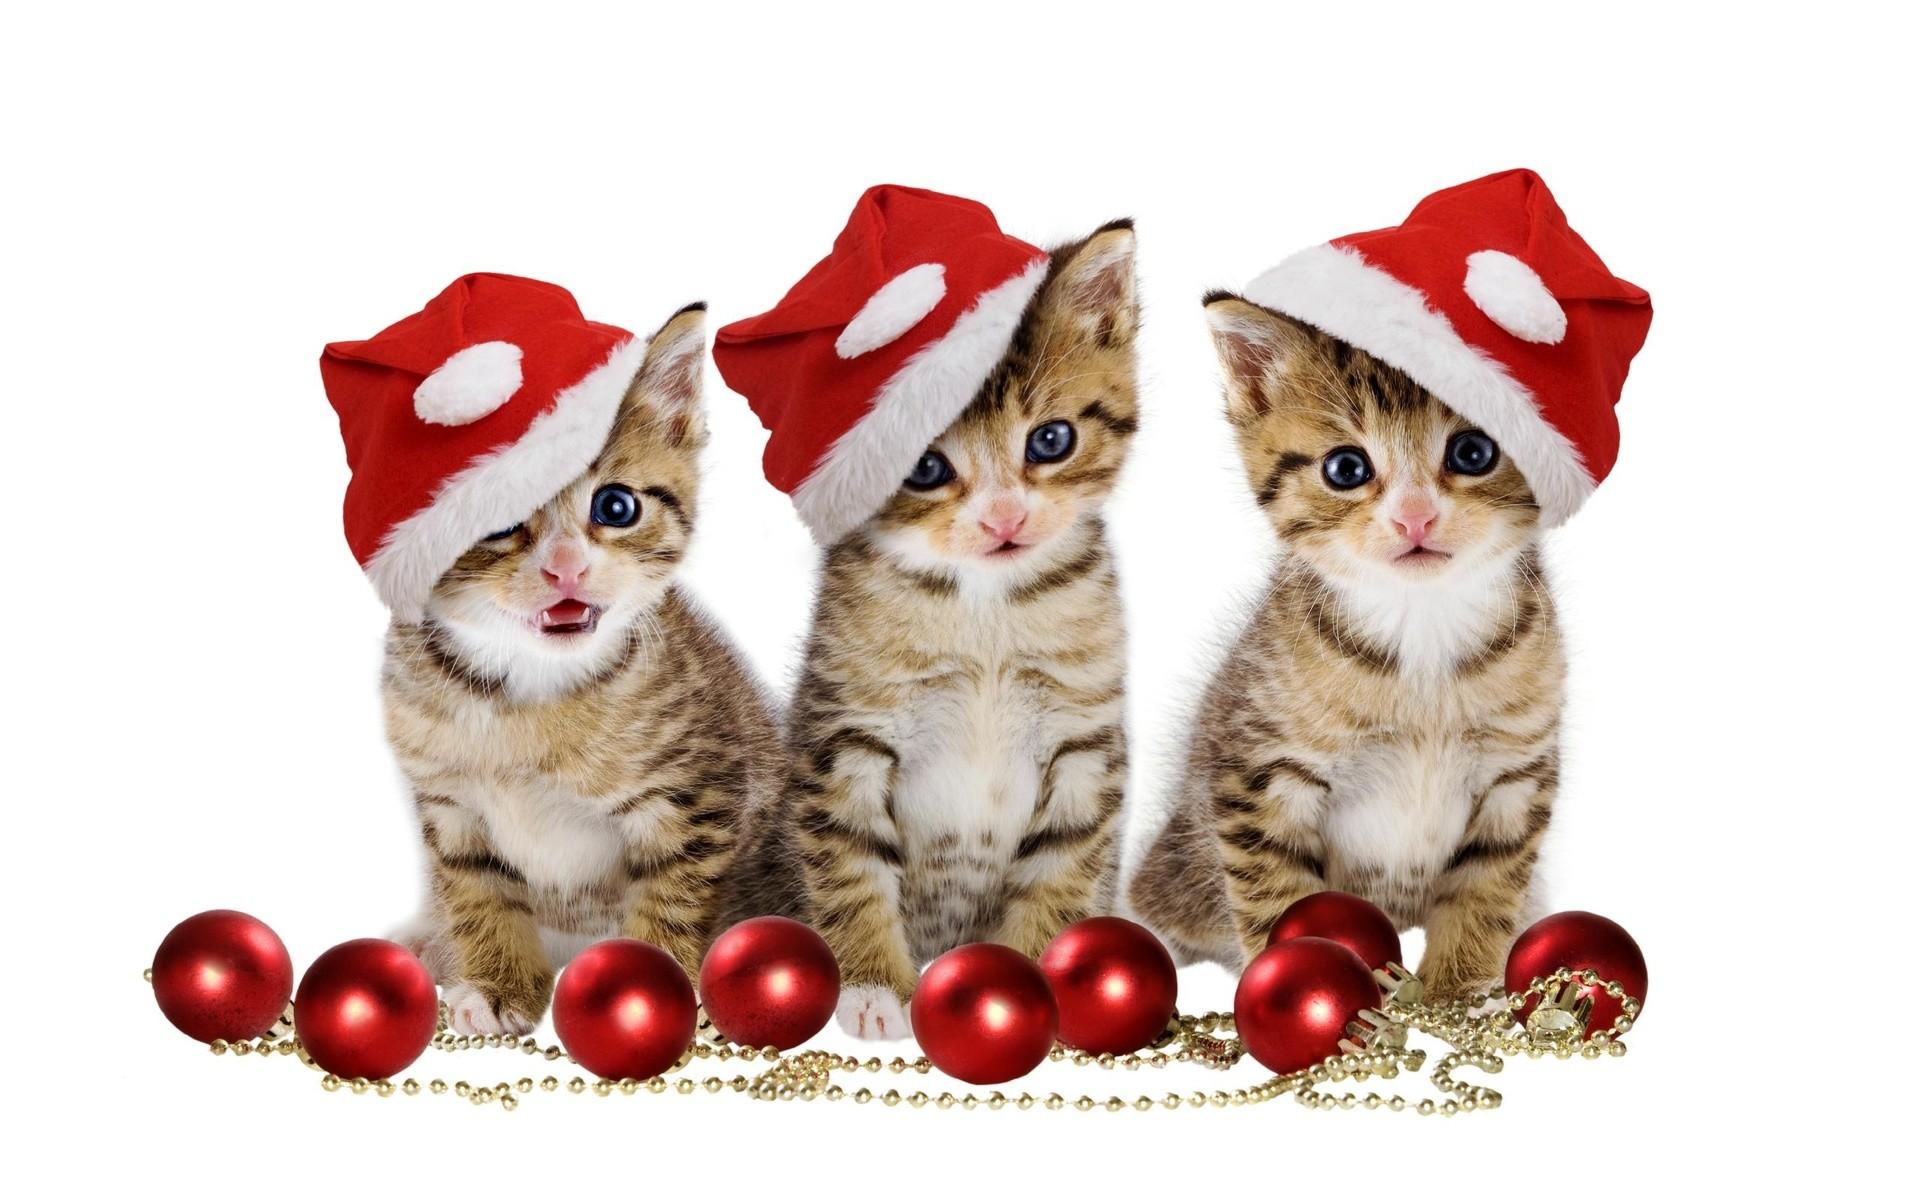 christmas-kittens-holiday-hd-wallpaper-